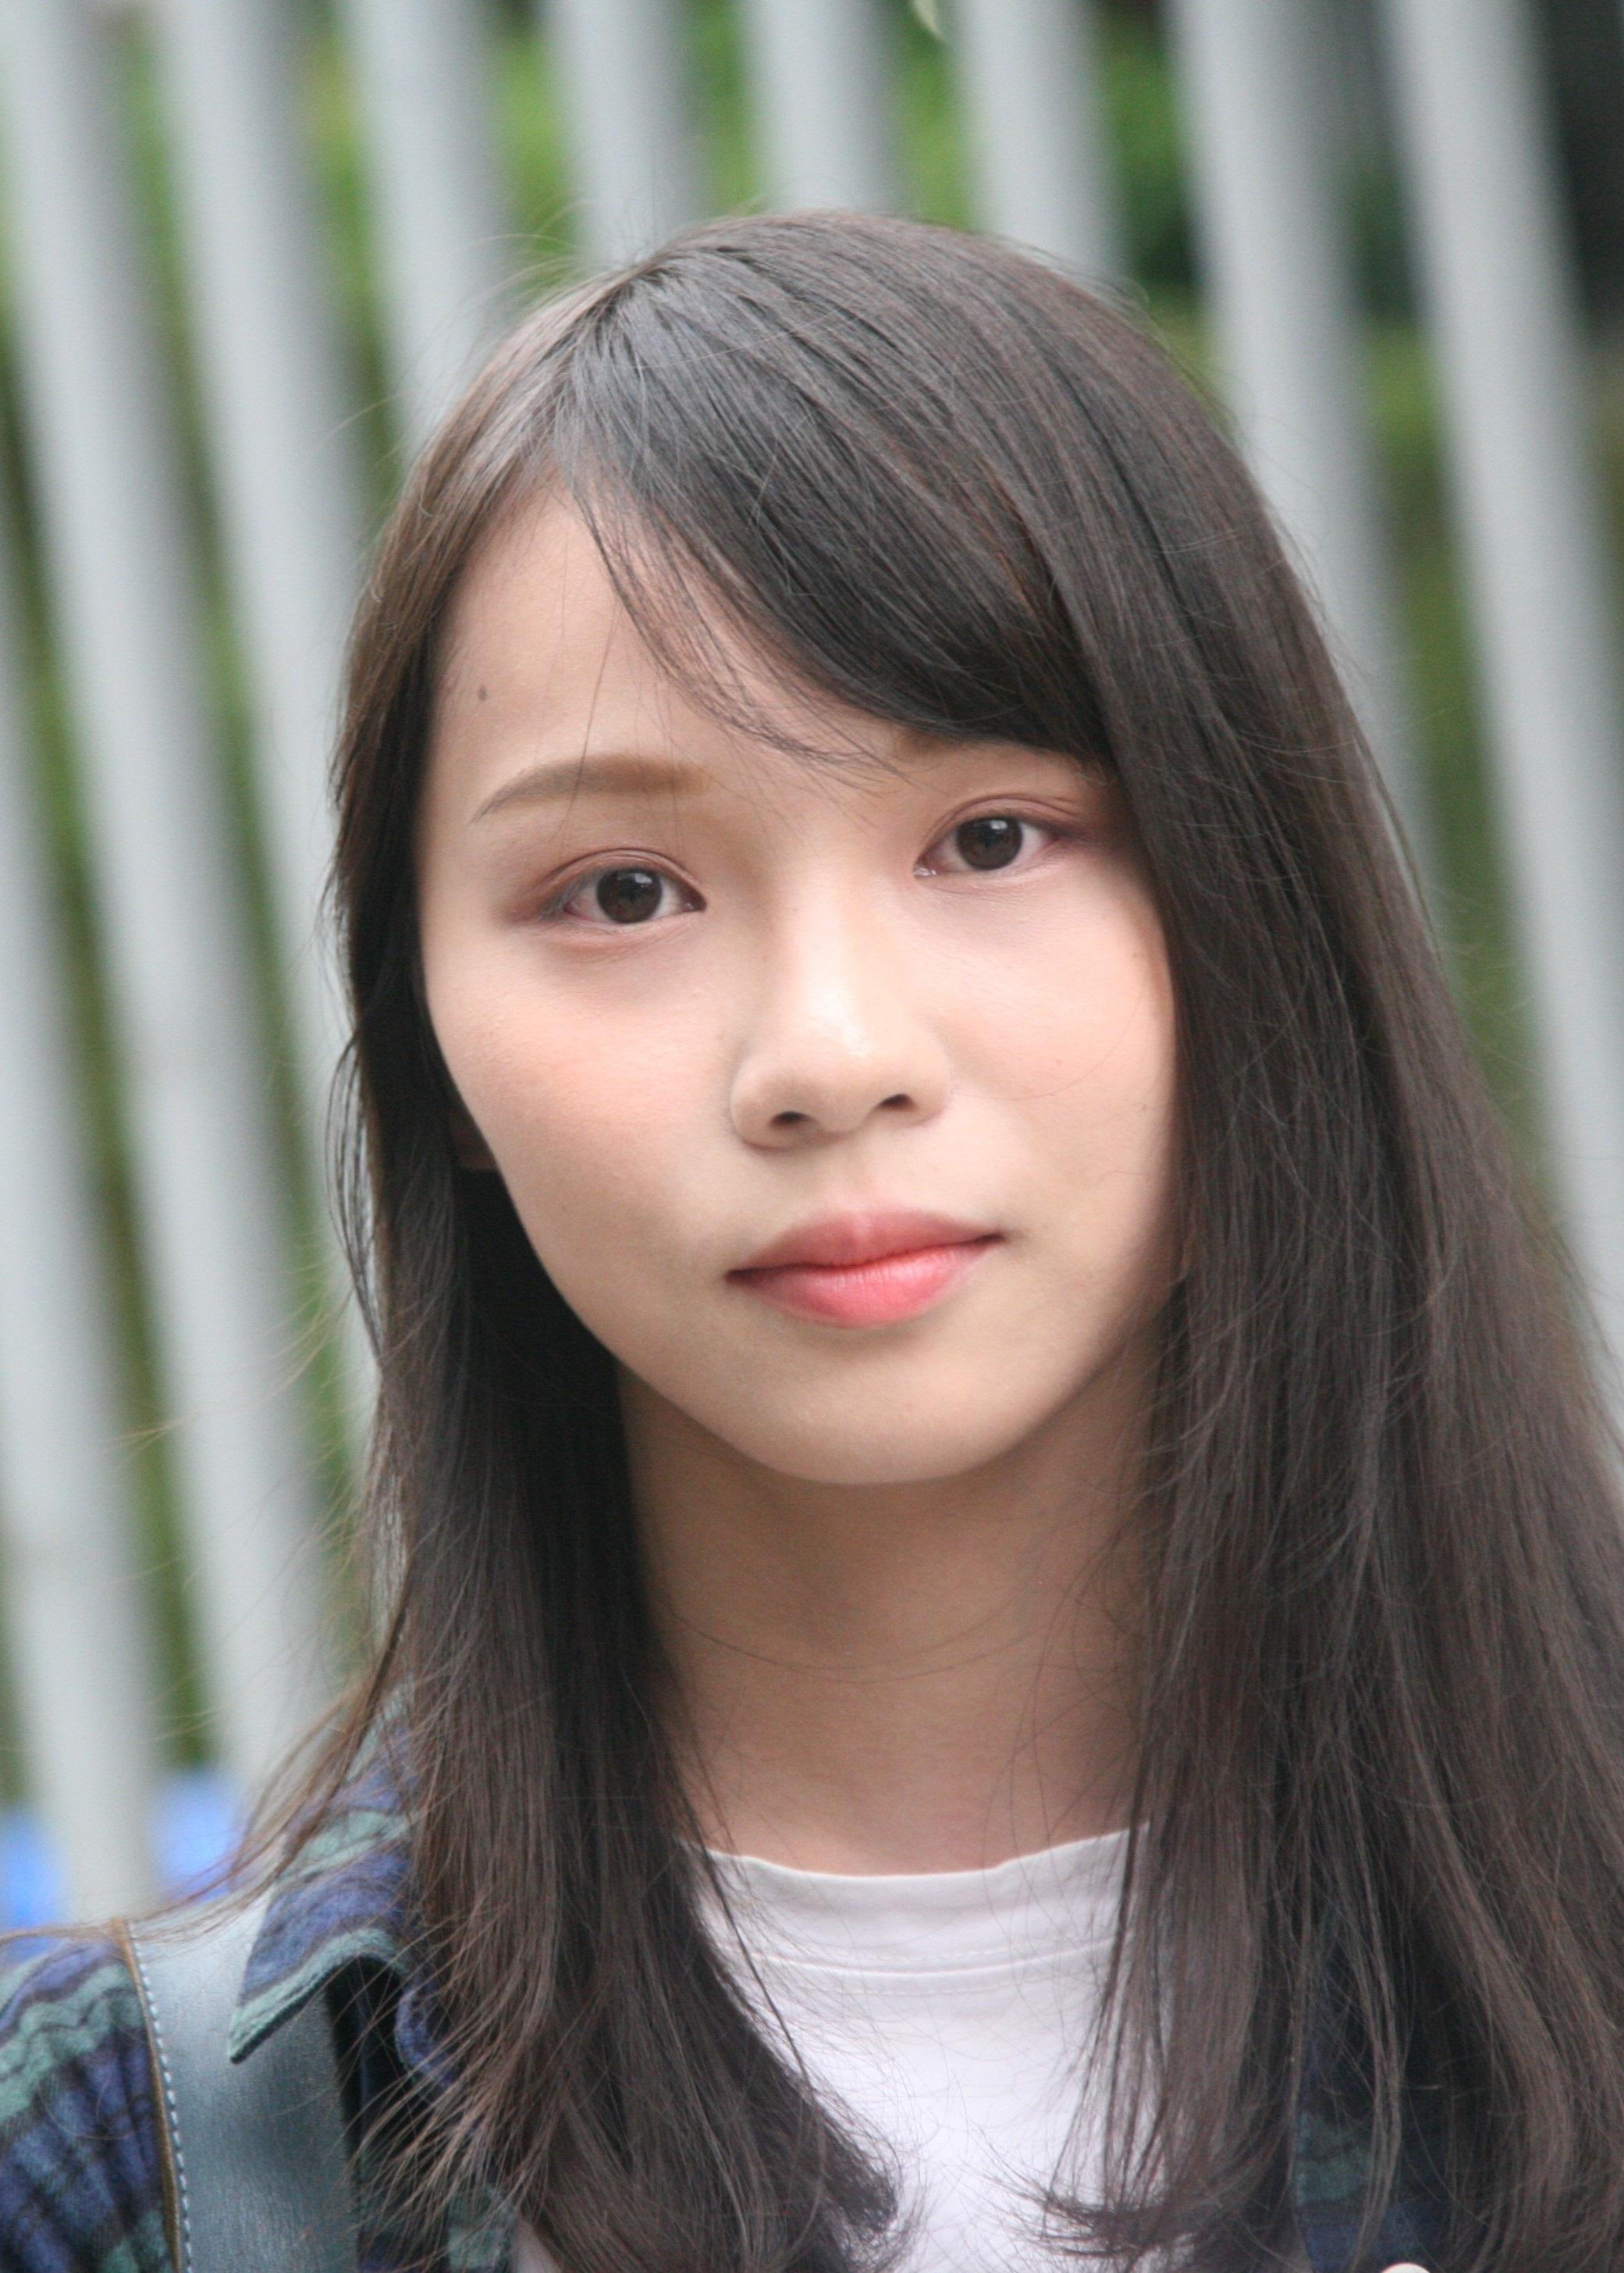 Agnes_Chow_on_Tim_Mei_Avenue_(cropped).jpg